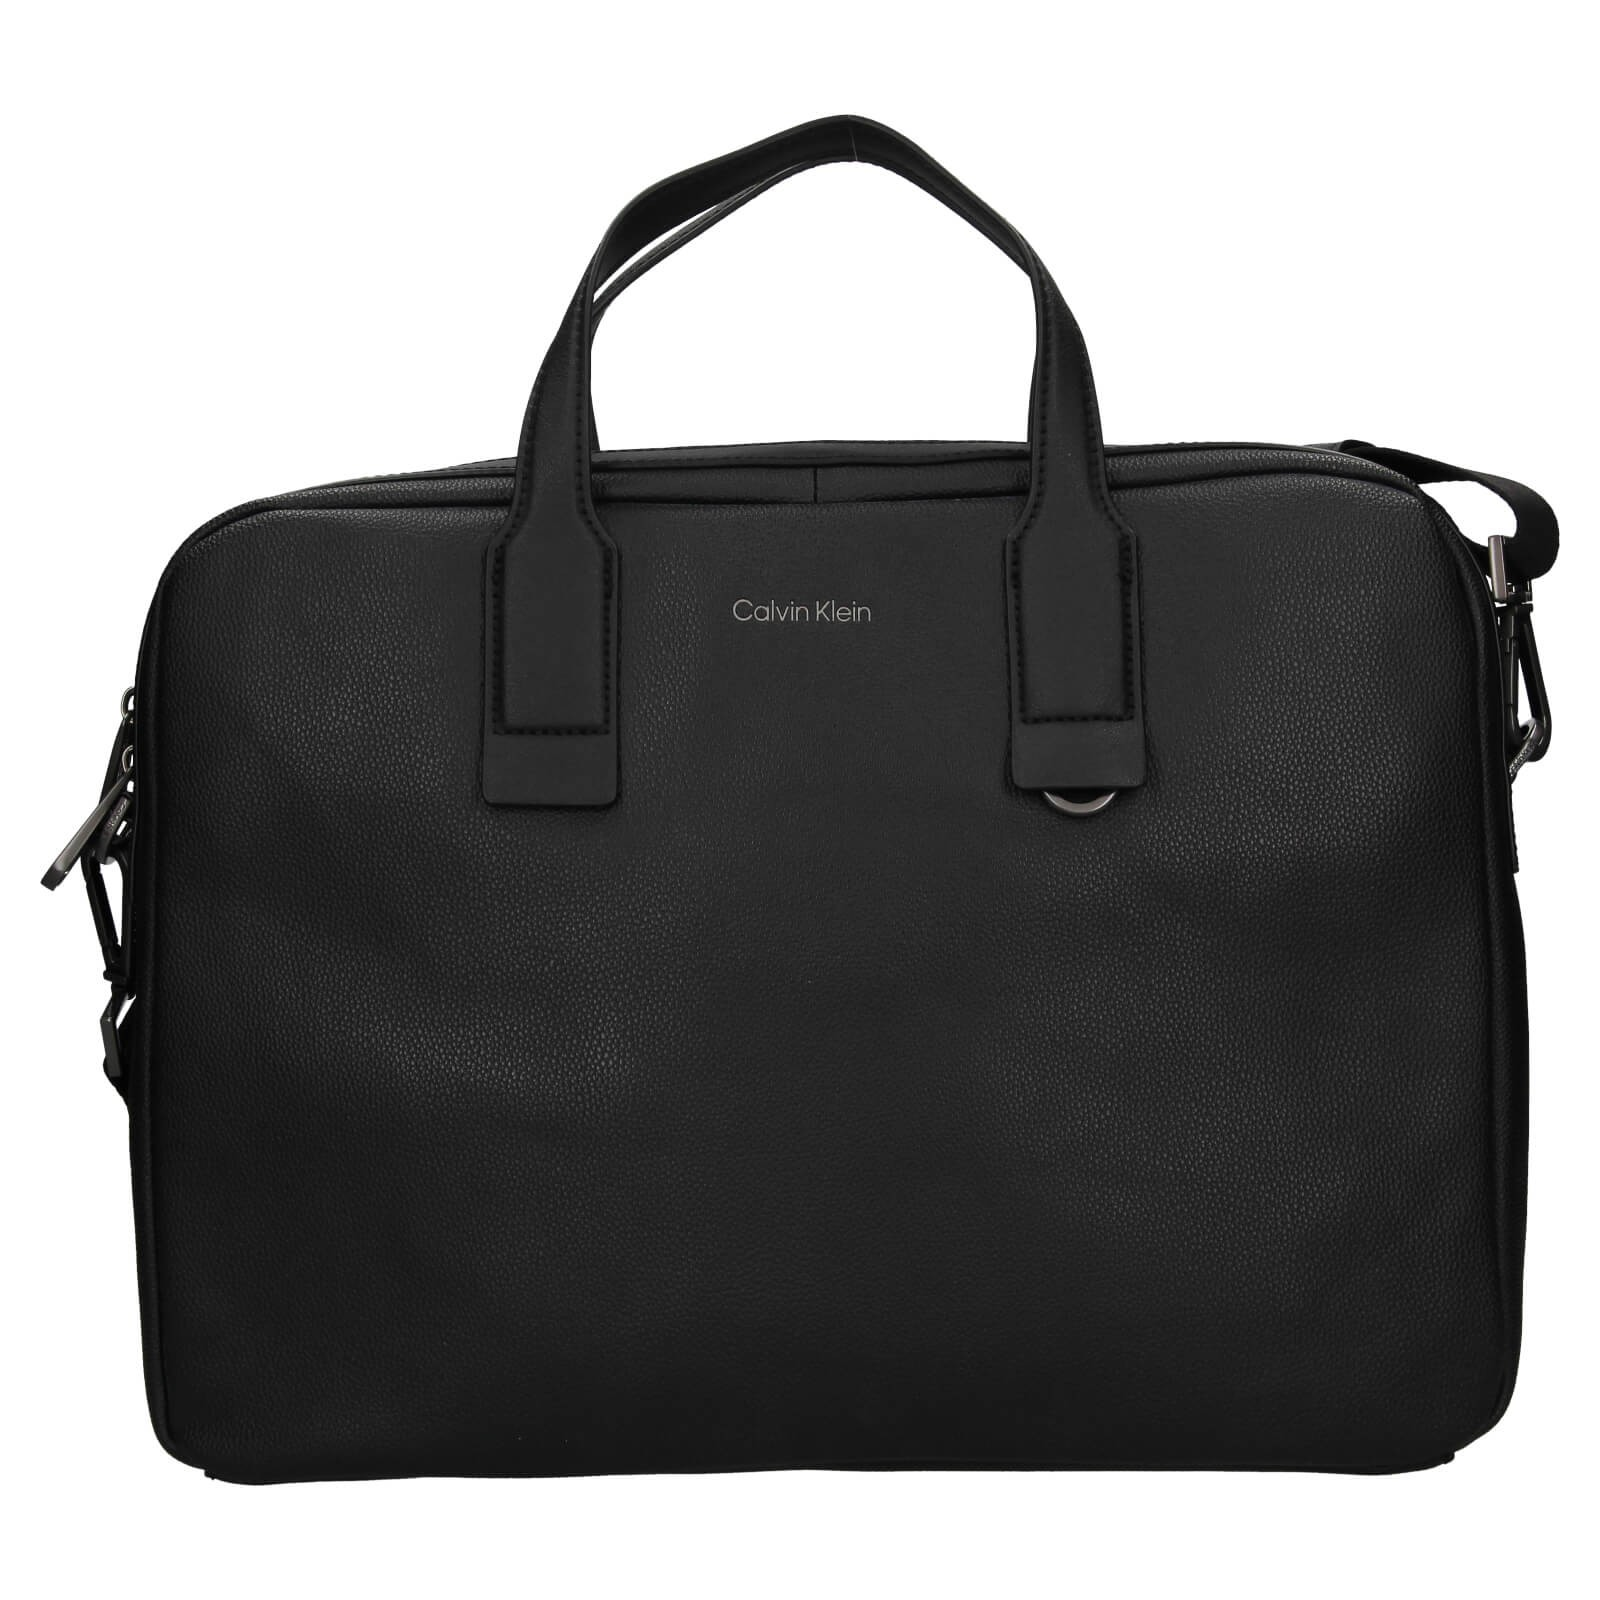 Pánská taška na notebook Calvin Klein Vilems - černá